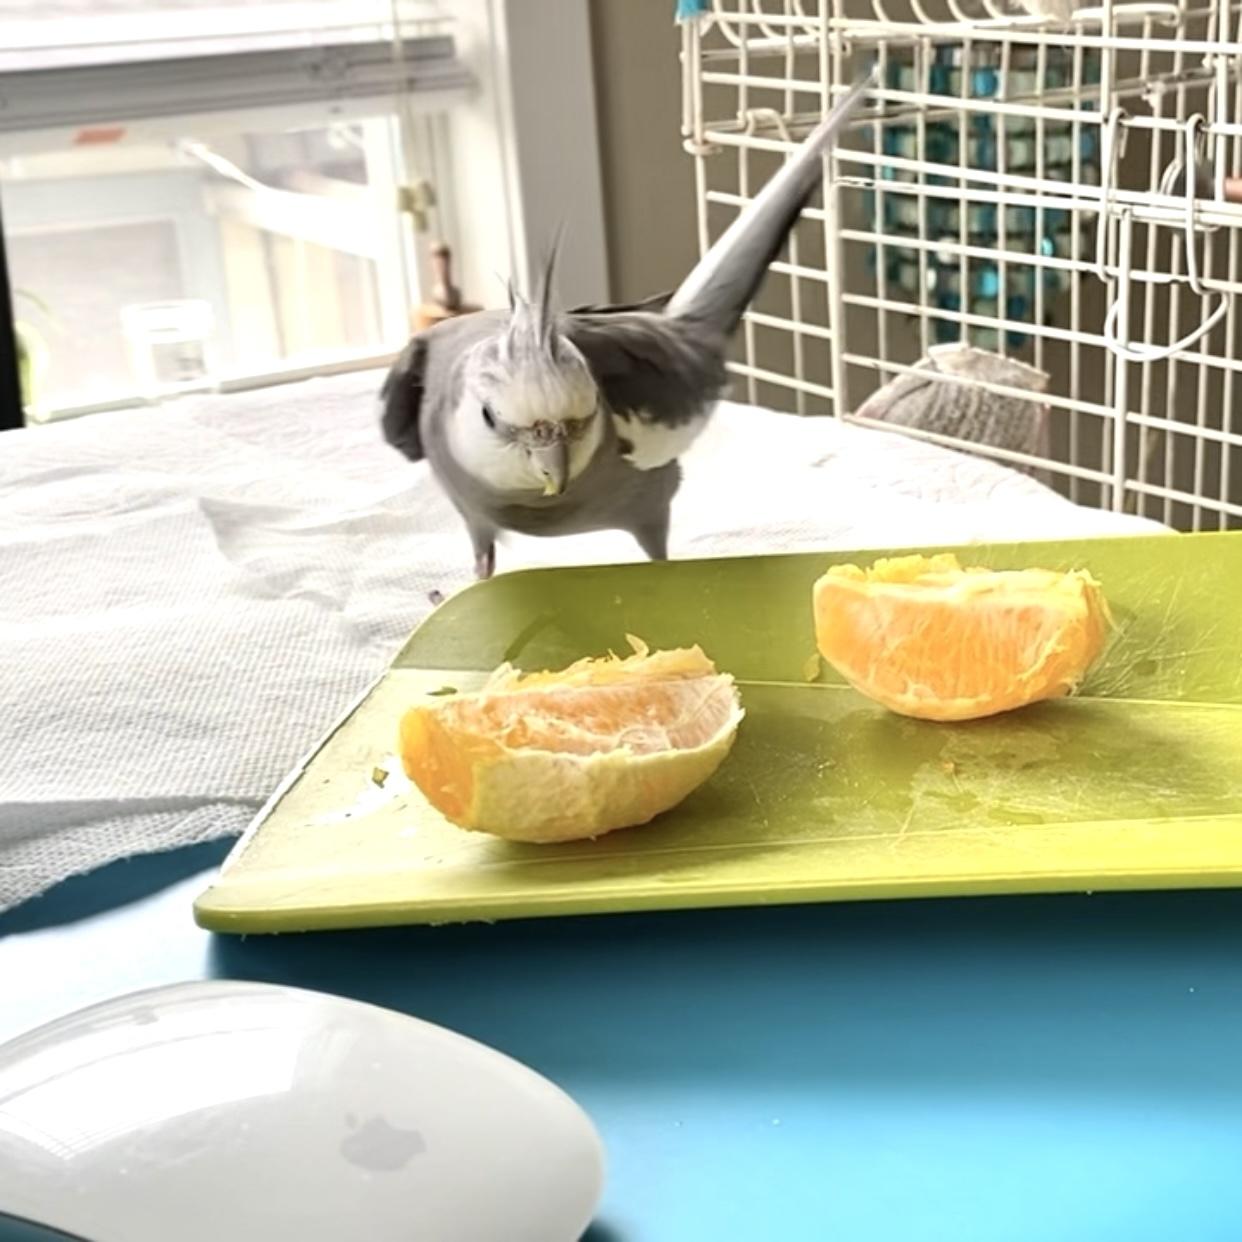 cockatiel with orange